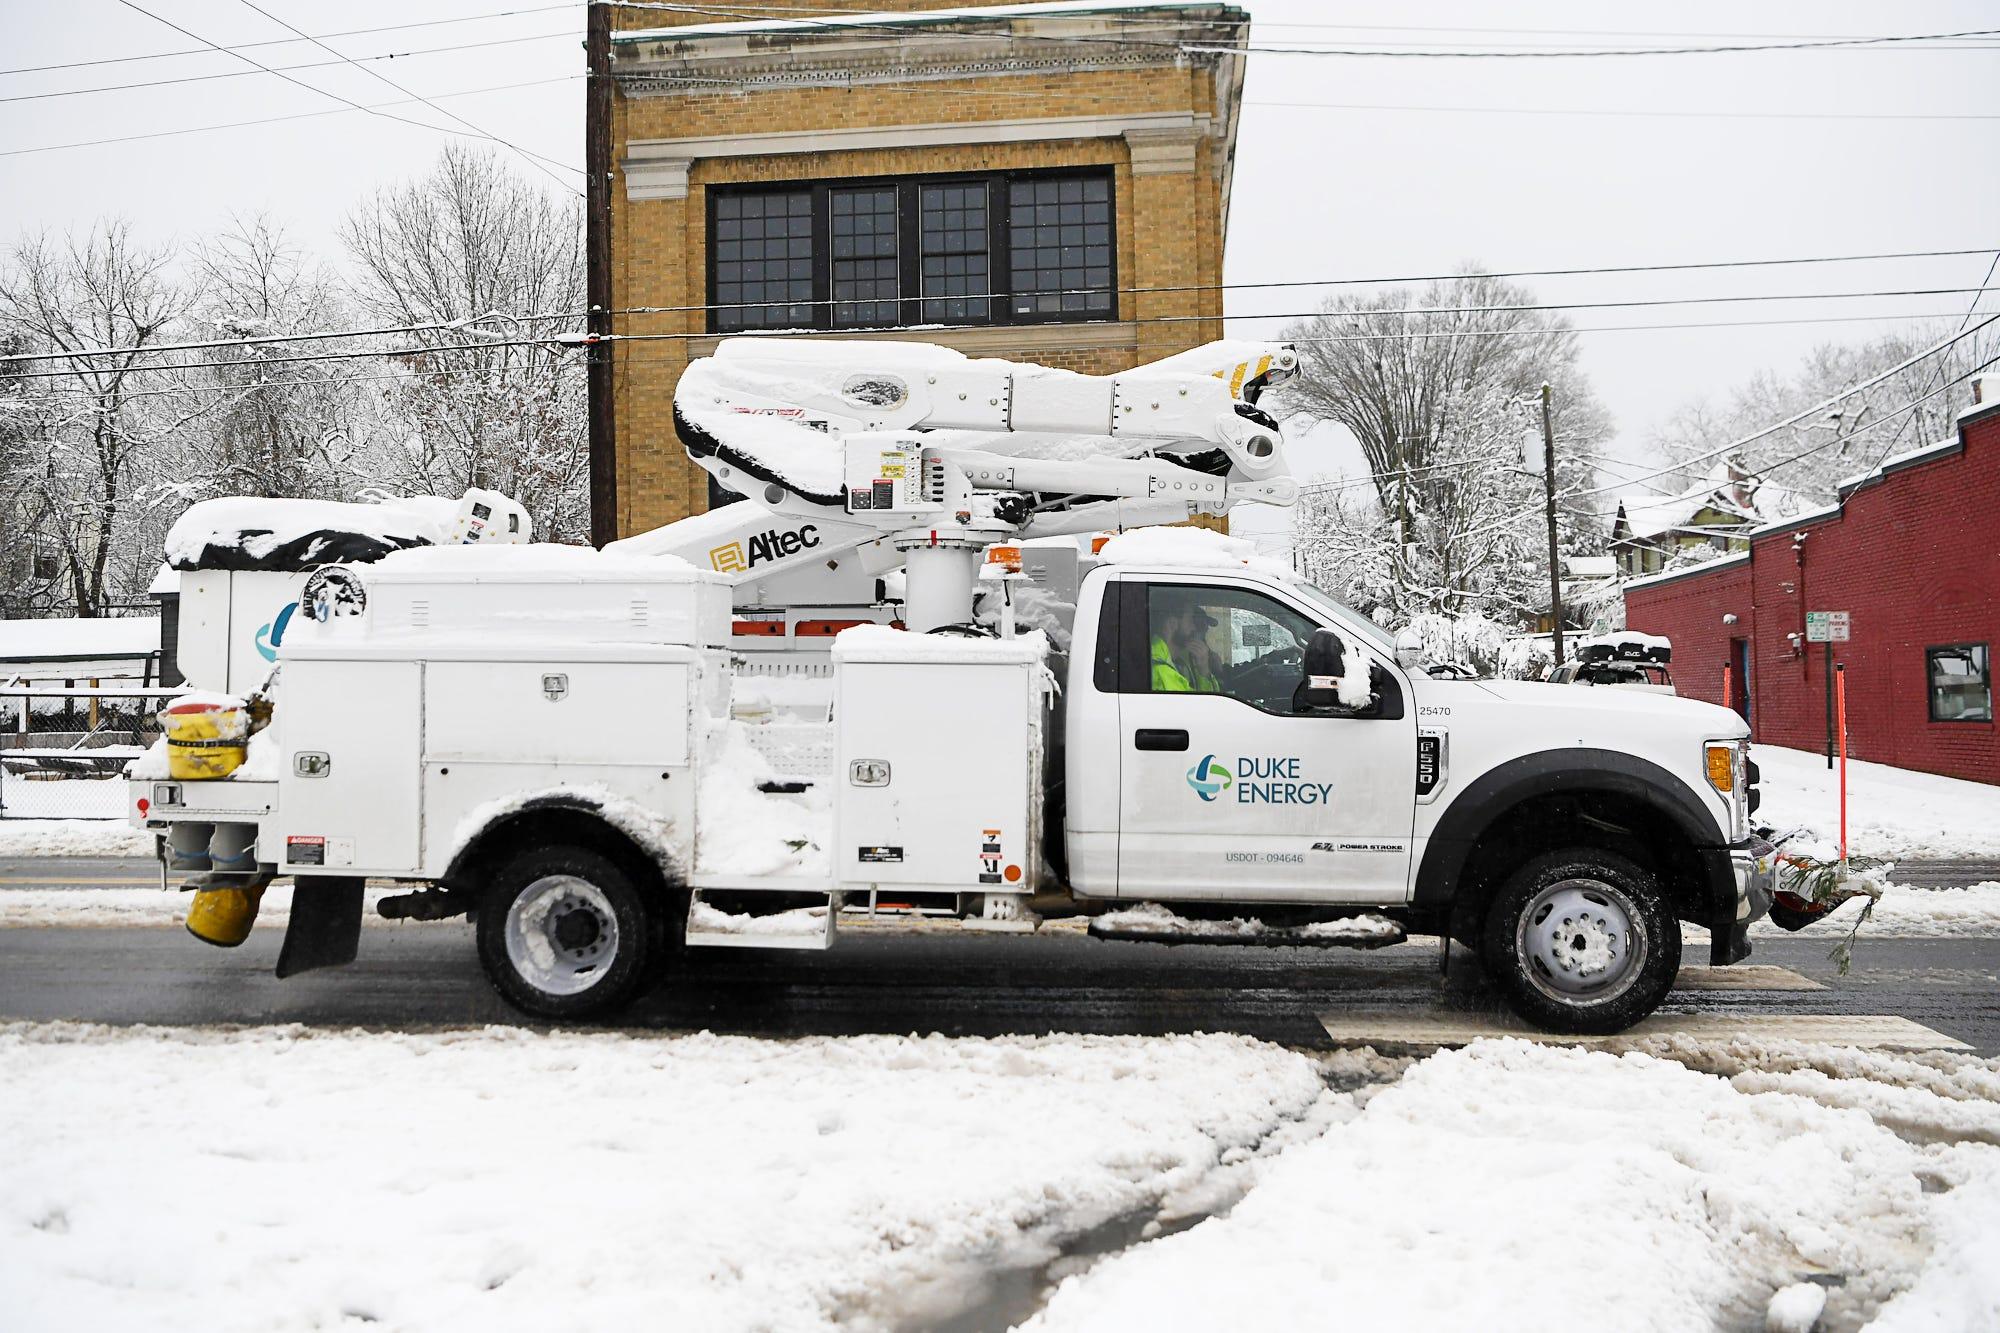 Western Snow Plow Troubleshooting